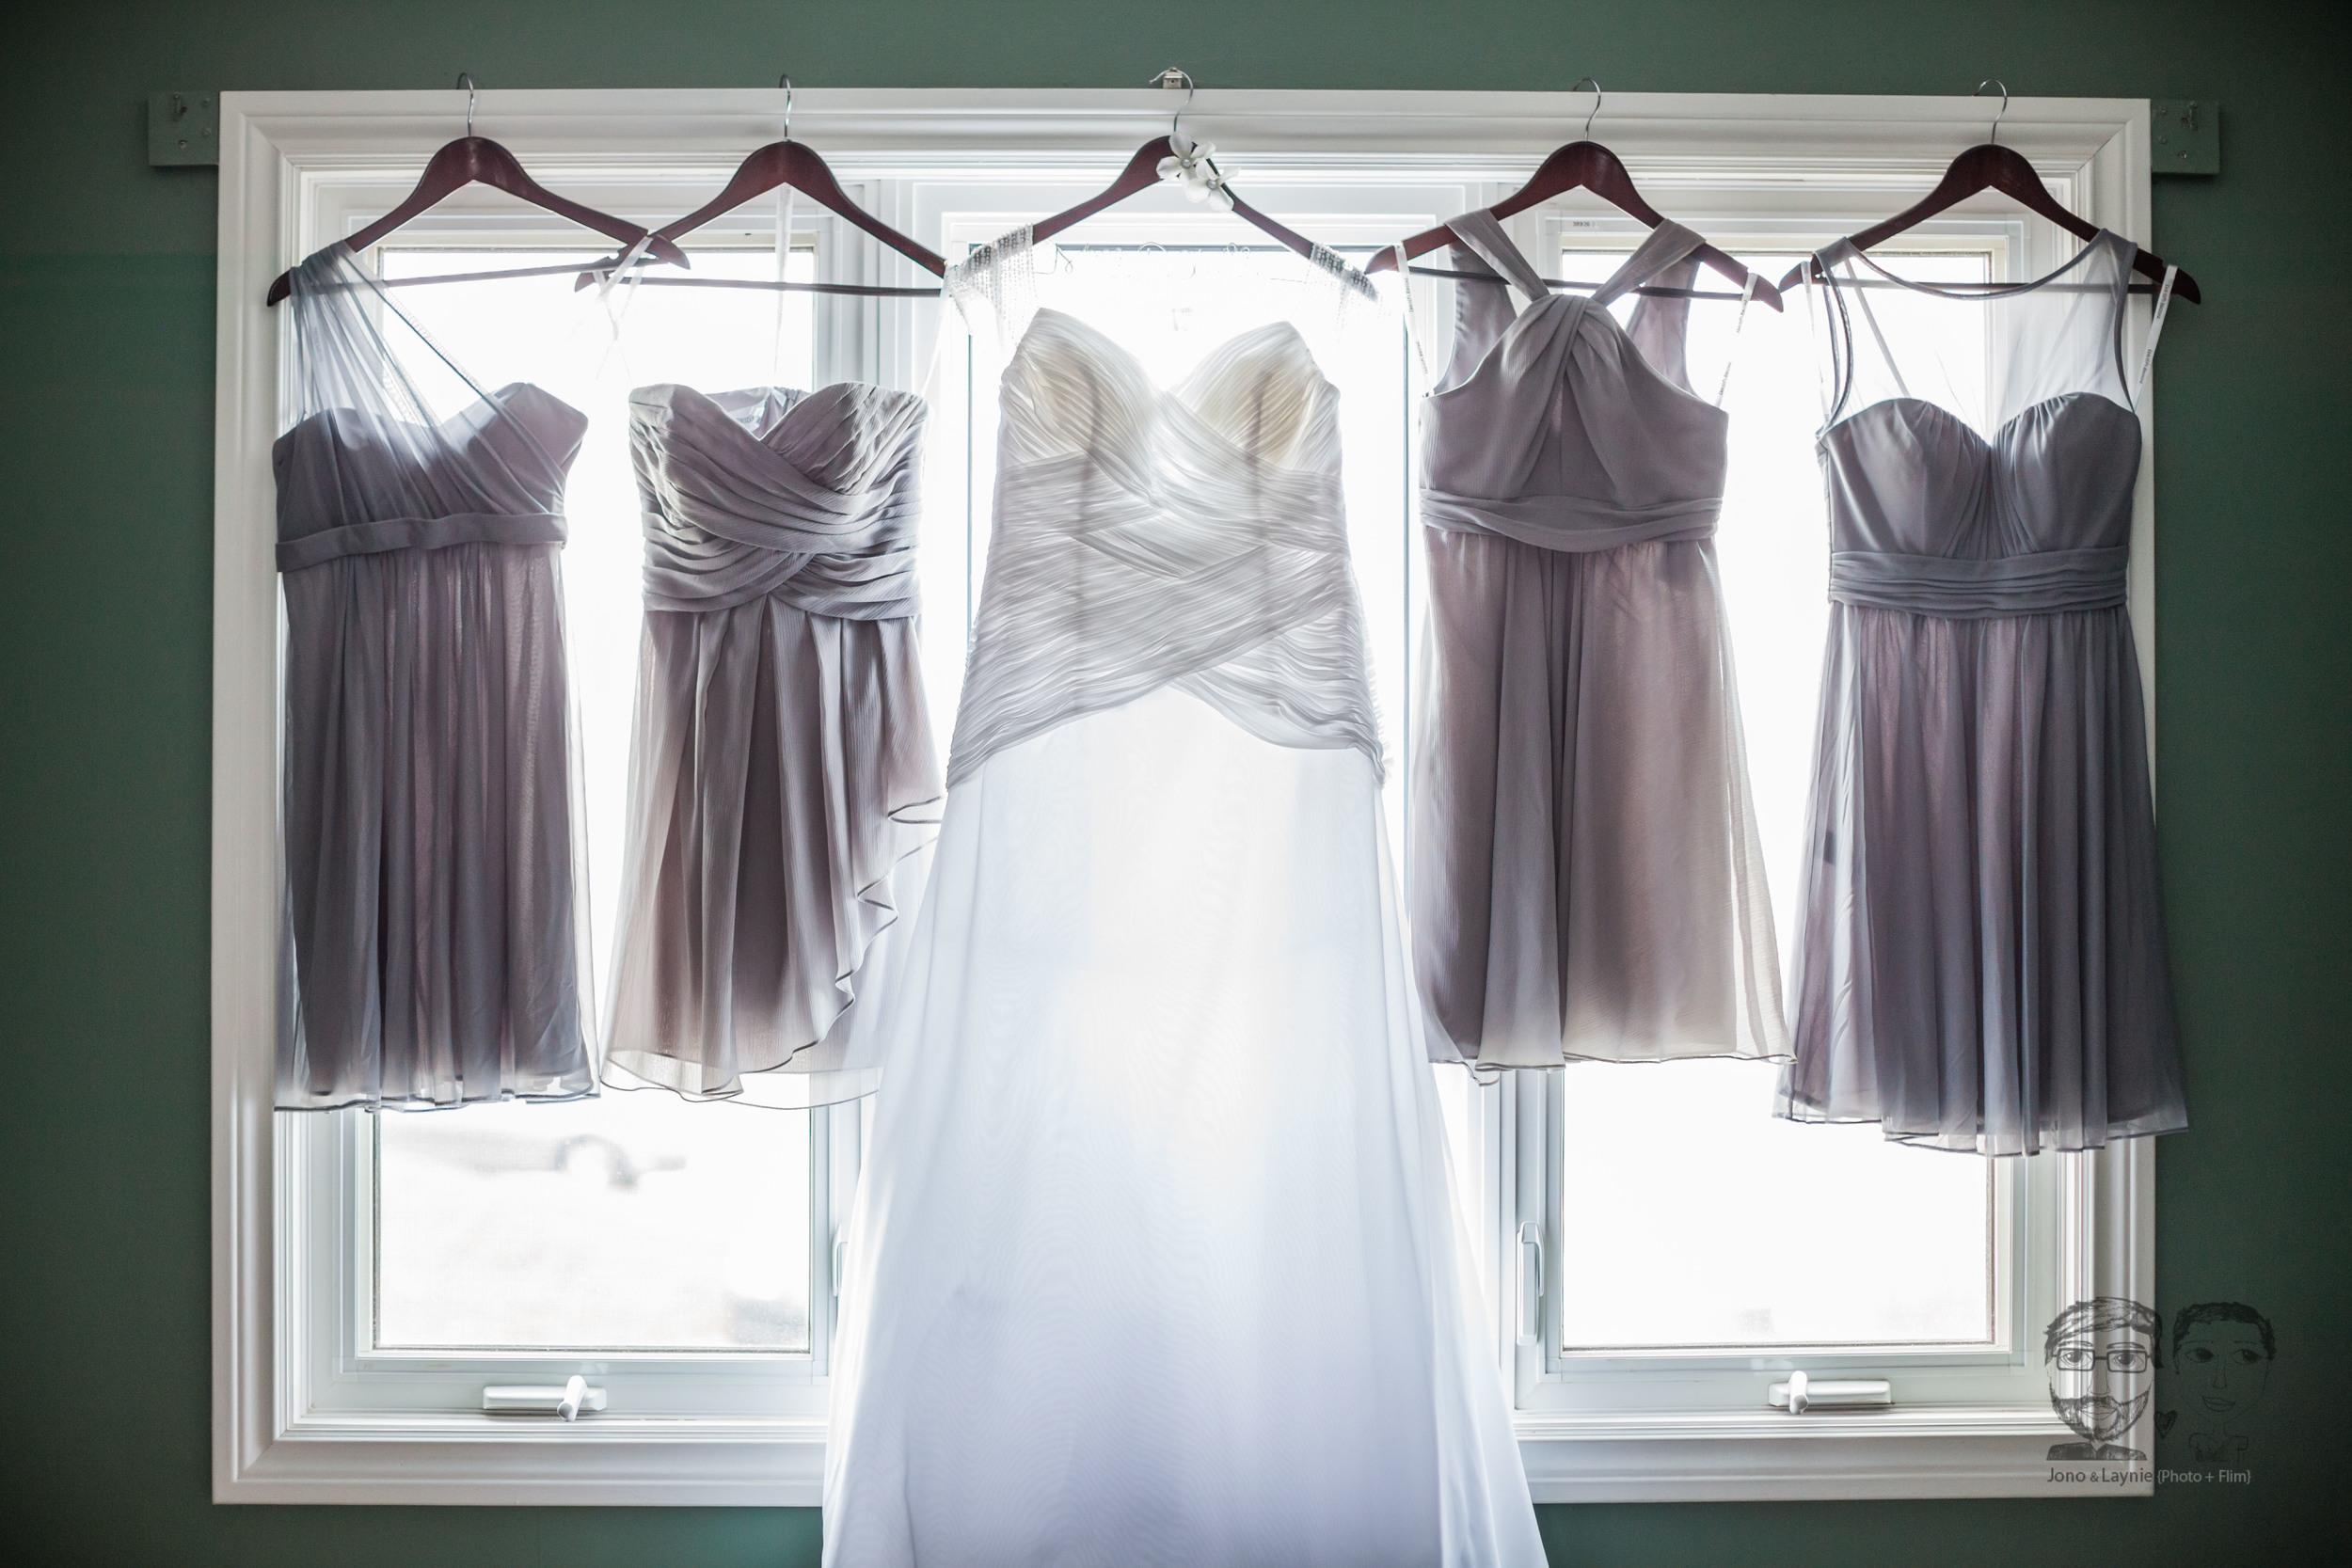 04Toronto Wedding Photographers and Videographers-Jono & Laynie Co.-Orangeville Wedding.jpg